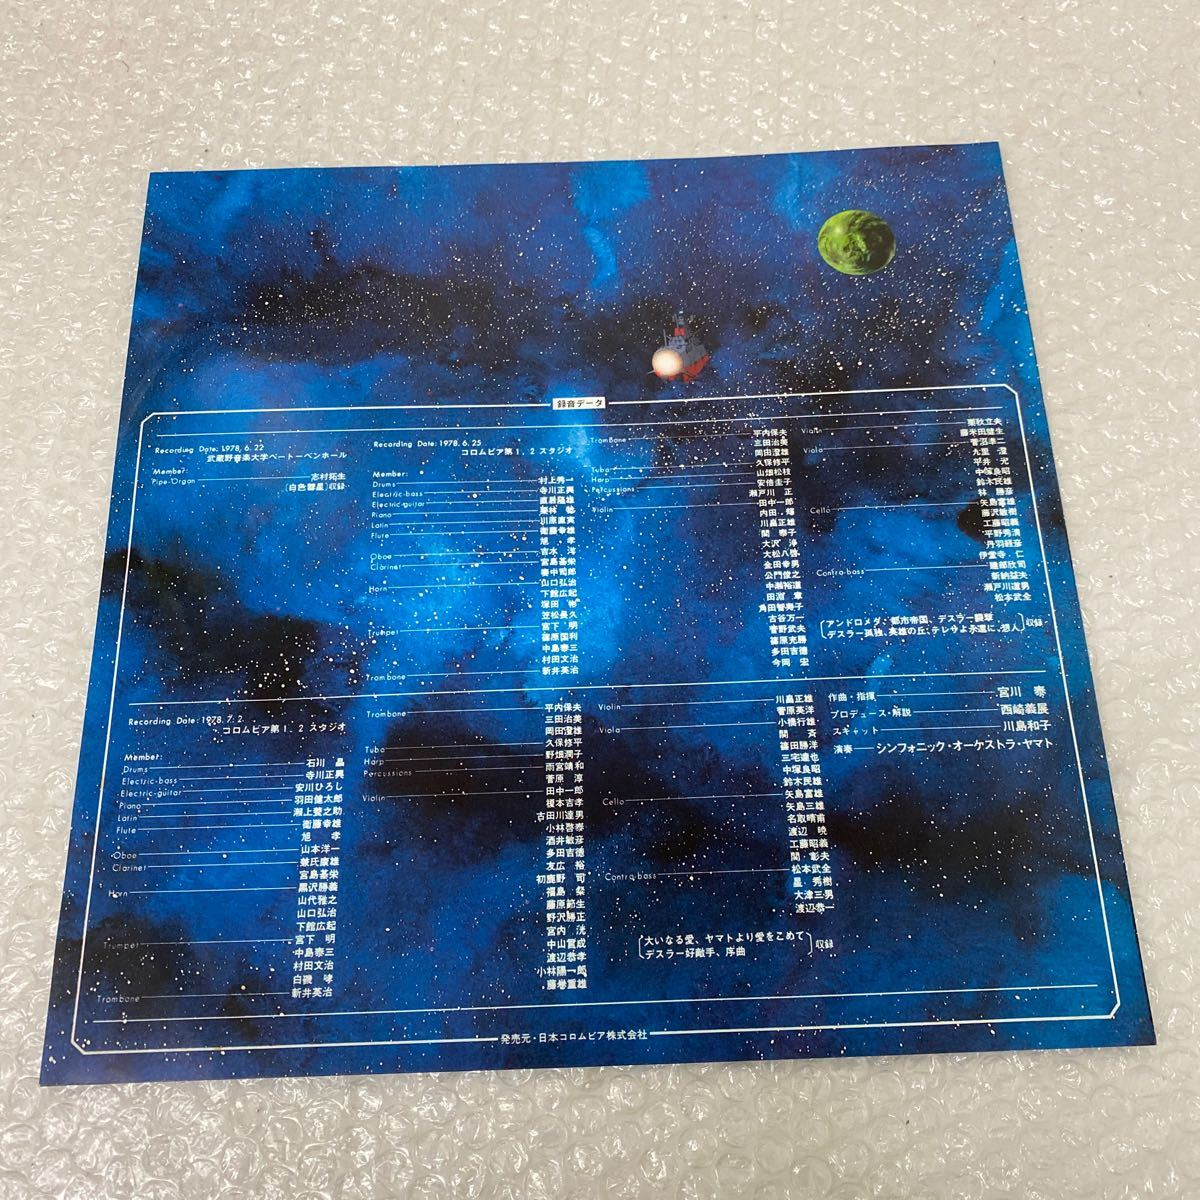 【LP】さらば宇宙戦艦ヤマト 愛の戦士たち 映画音楽集/オリジナルサウンドトラック(CQ-7011)日本コロムビア_画像5